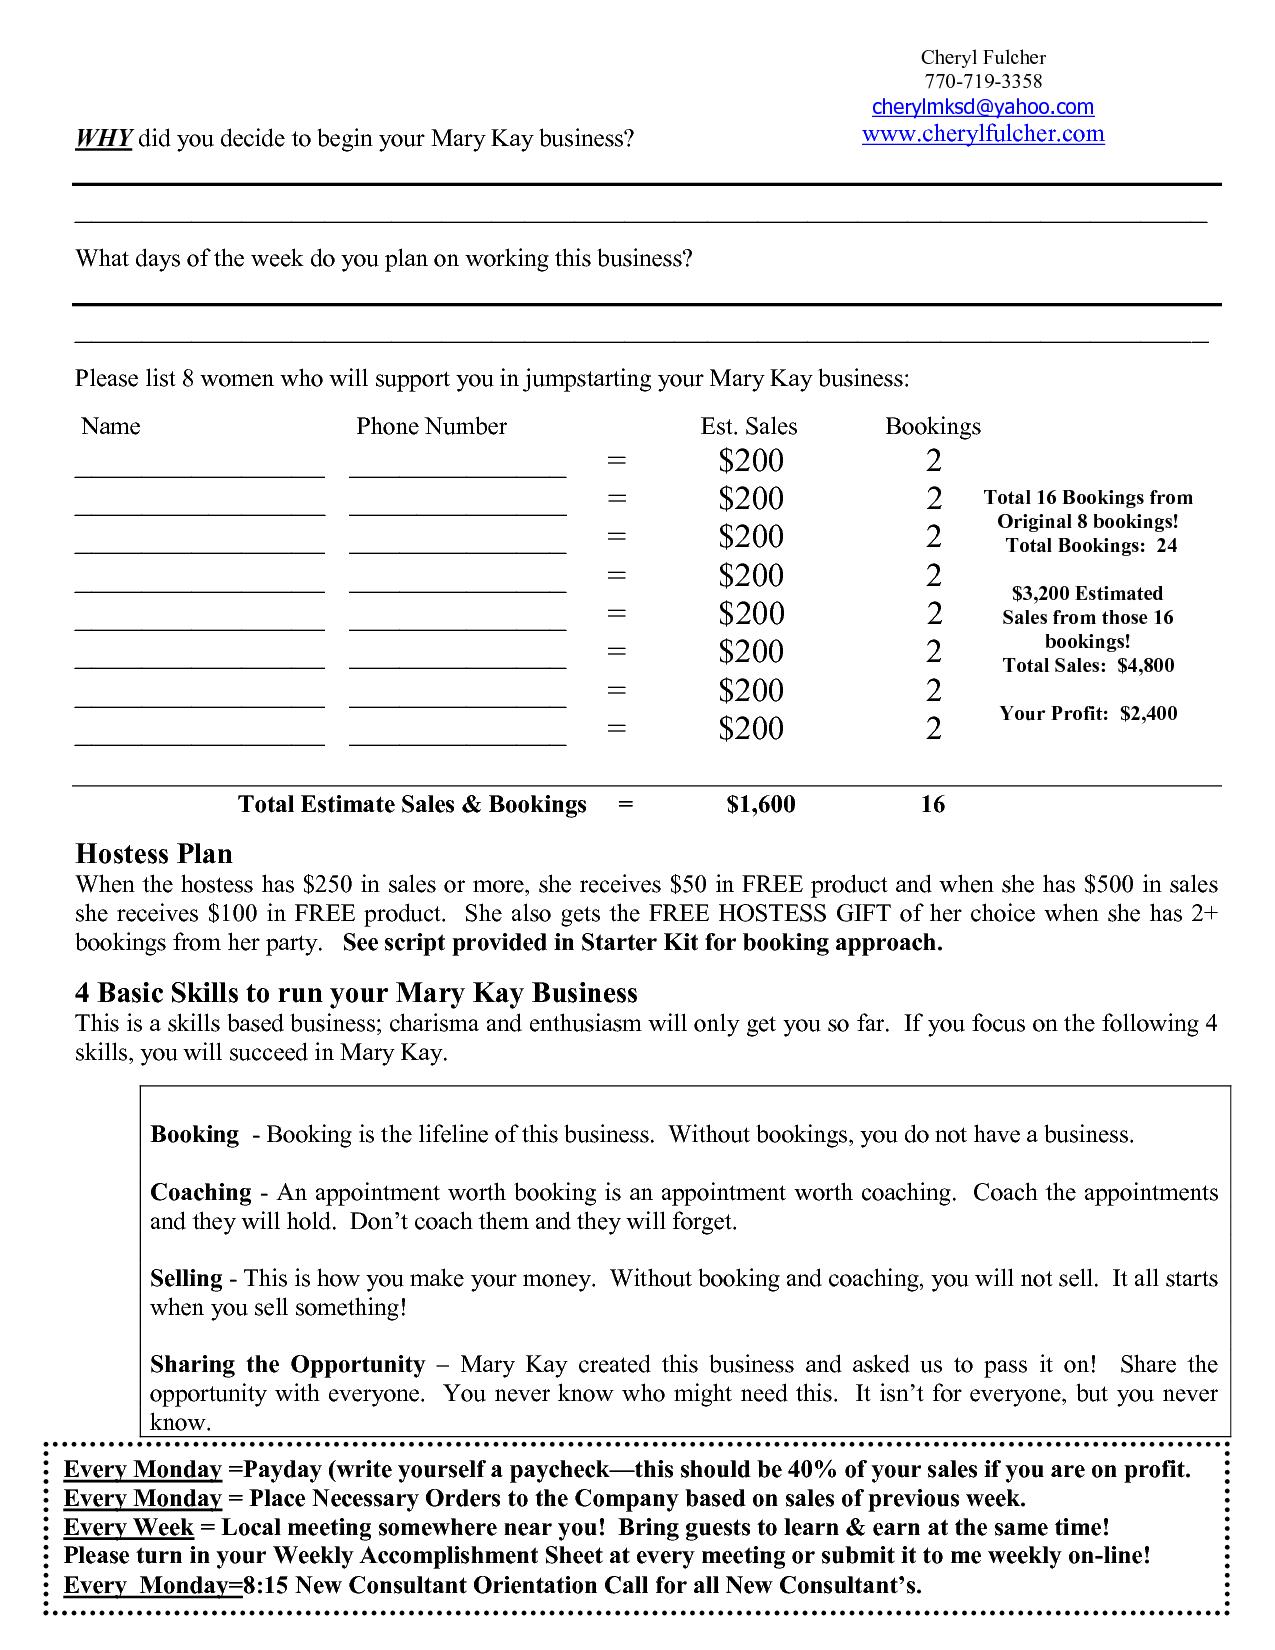 Tax Planning Worksheet